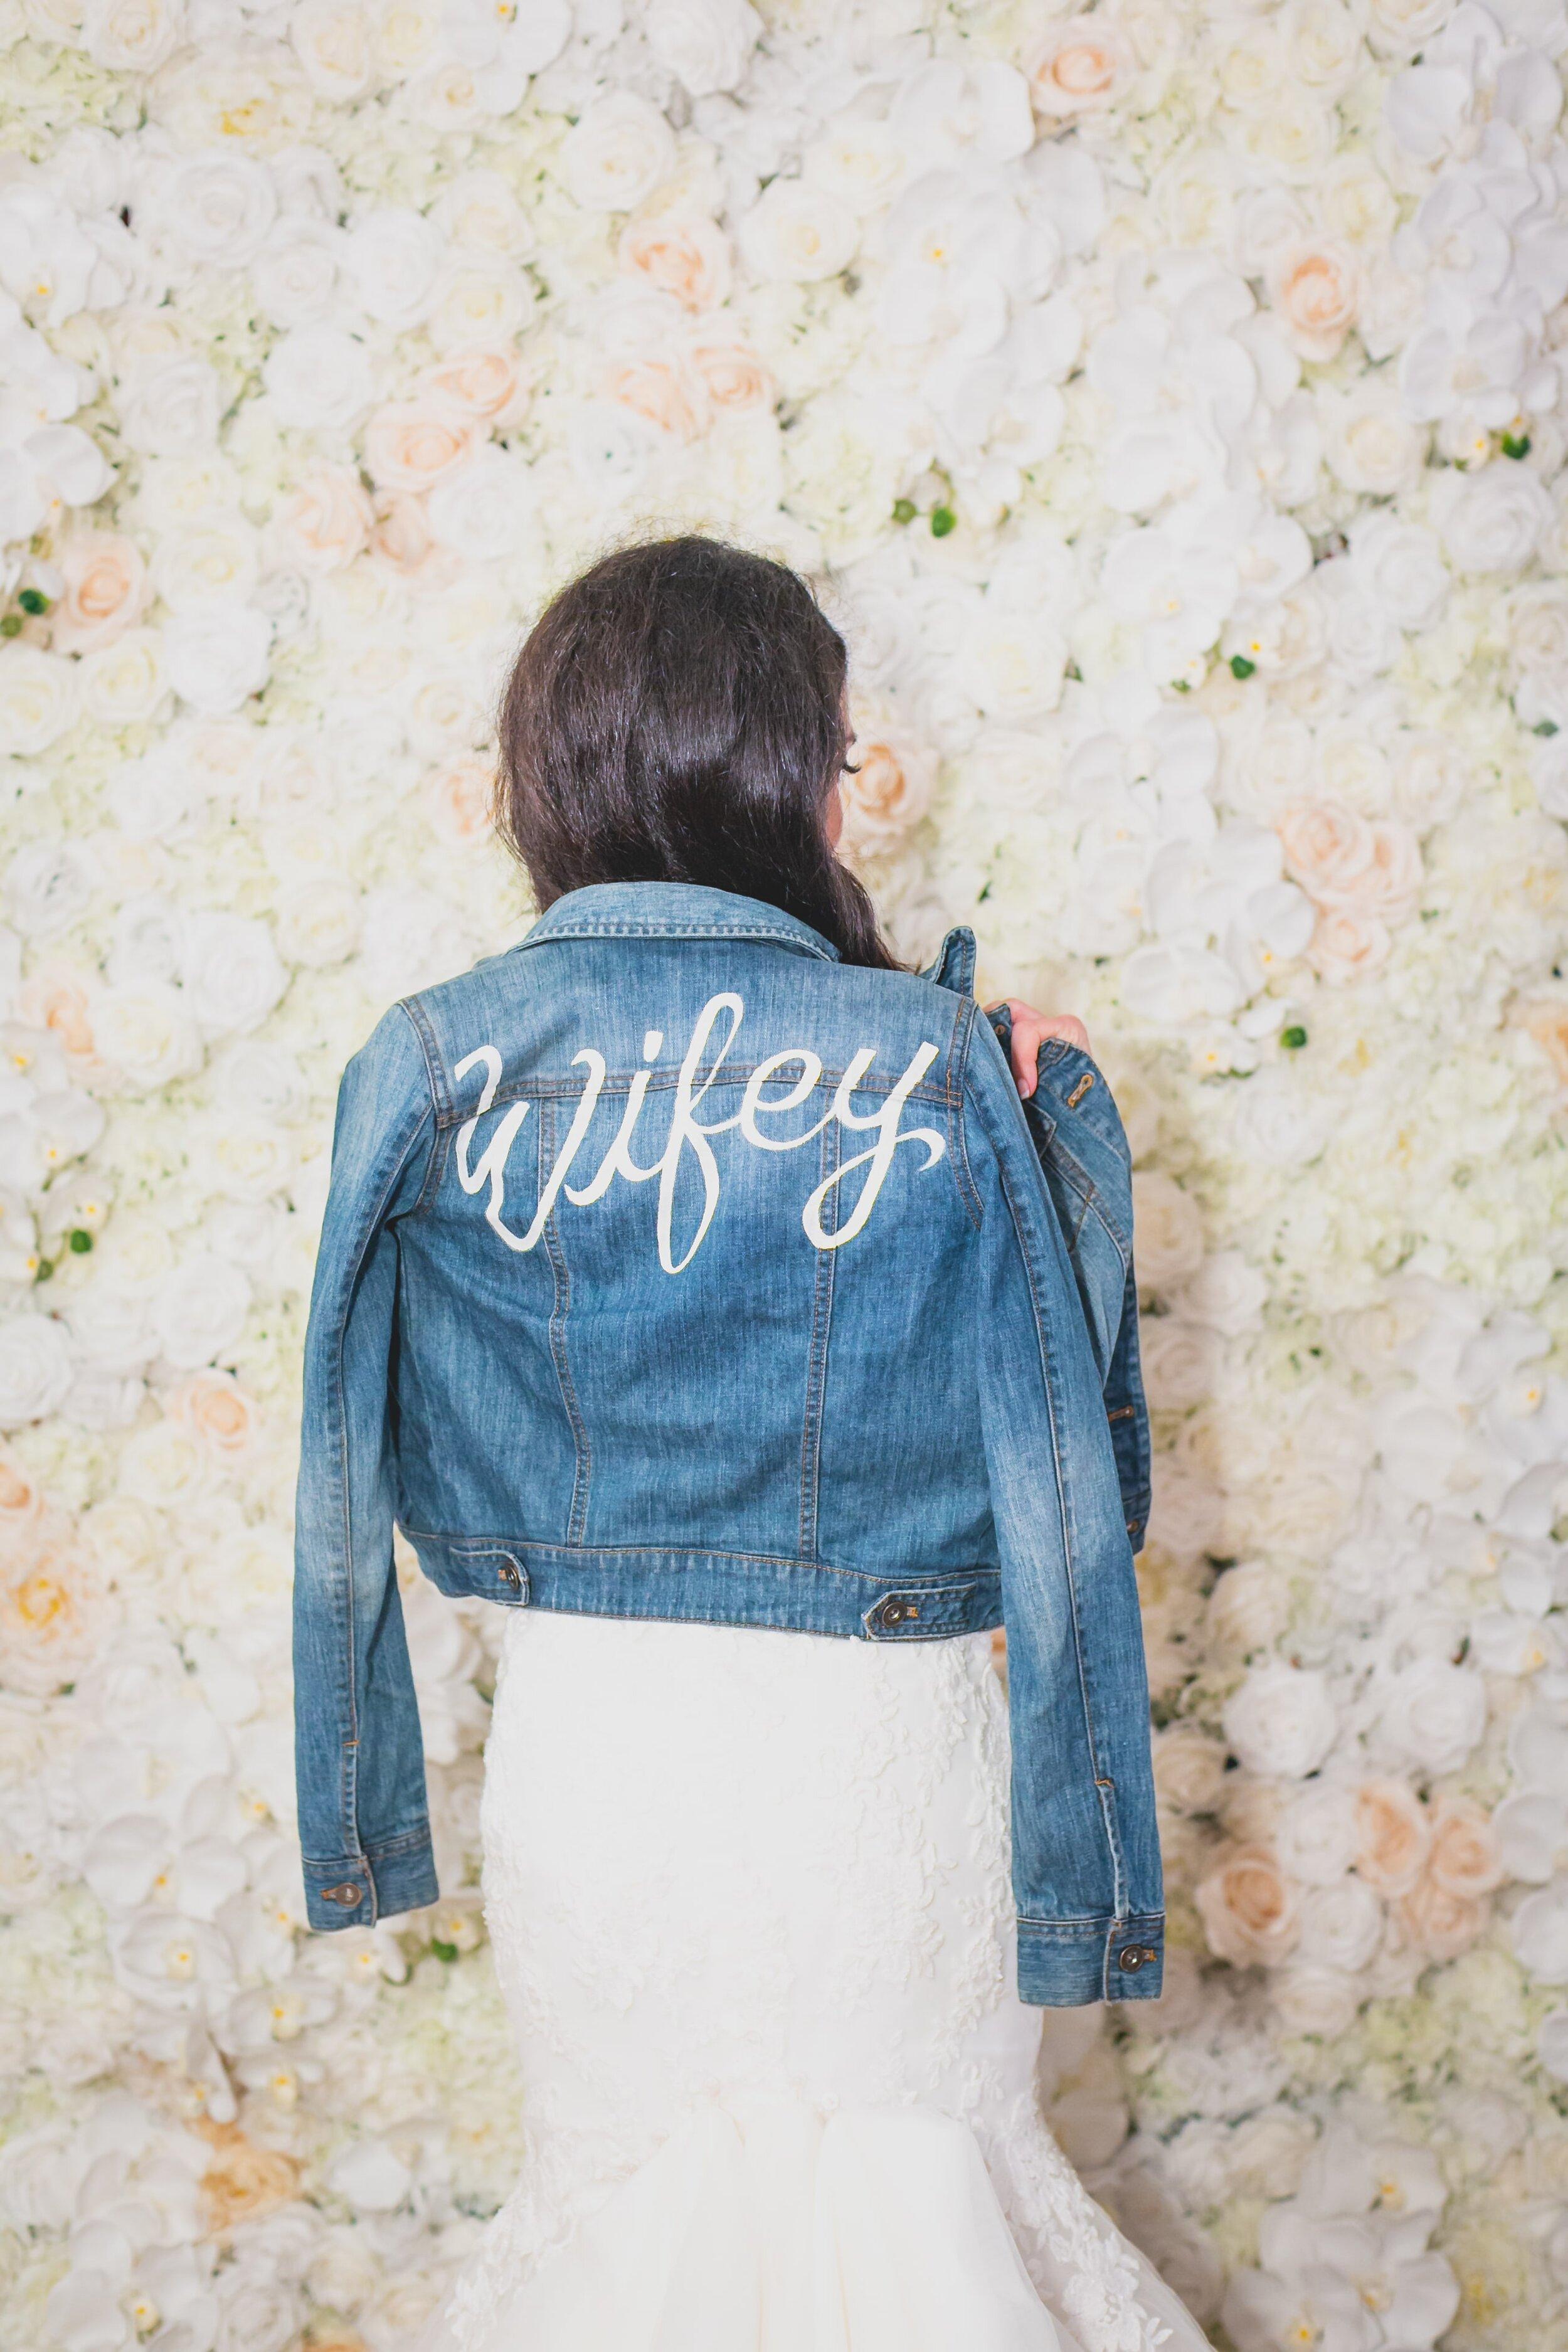 fall-wedding-accessories-that-will-keep-you-warm-denim-jacket